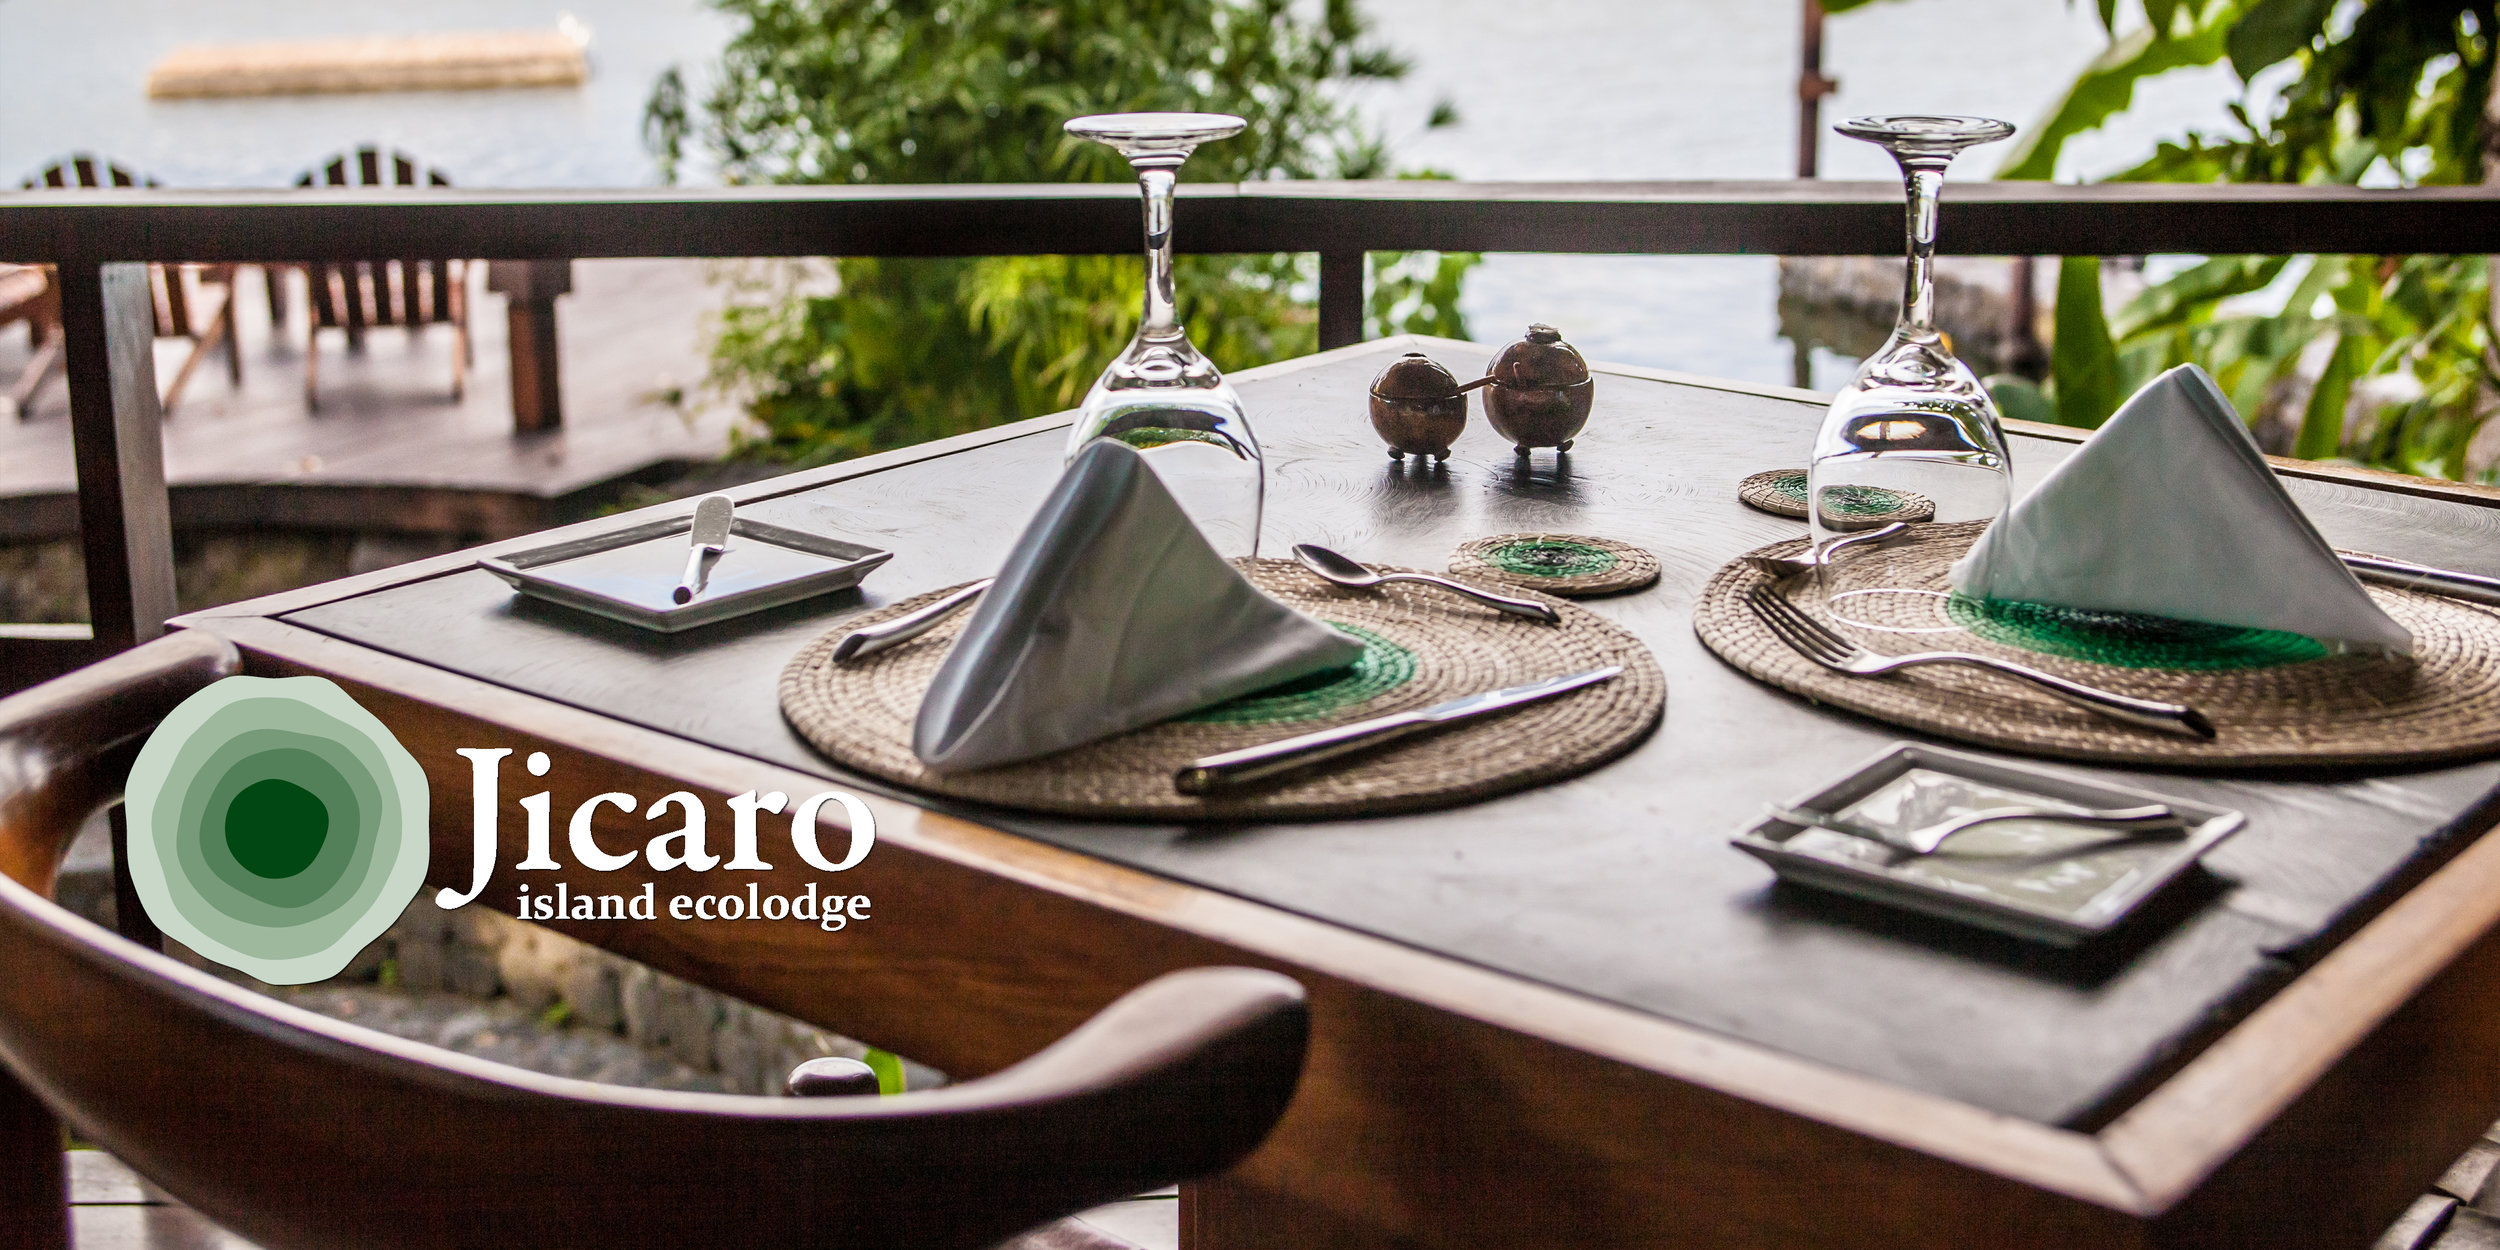 Jicaro Island Web Images 6.jpg